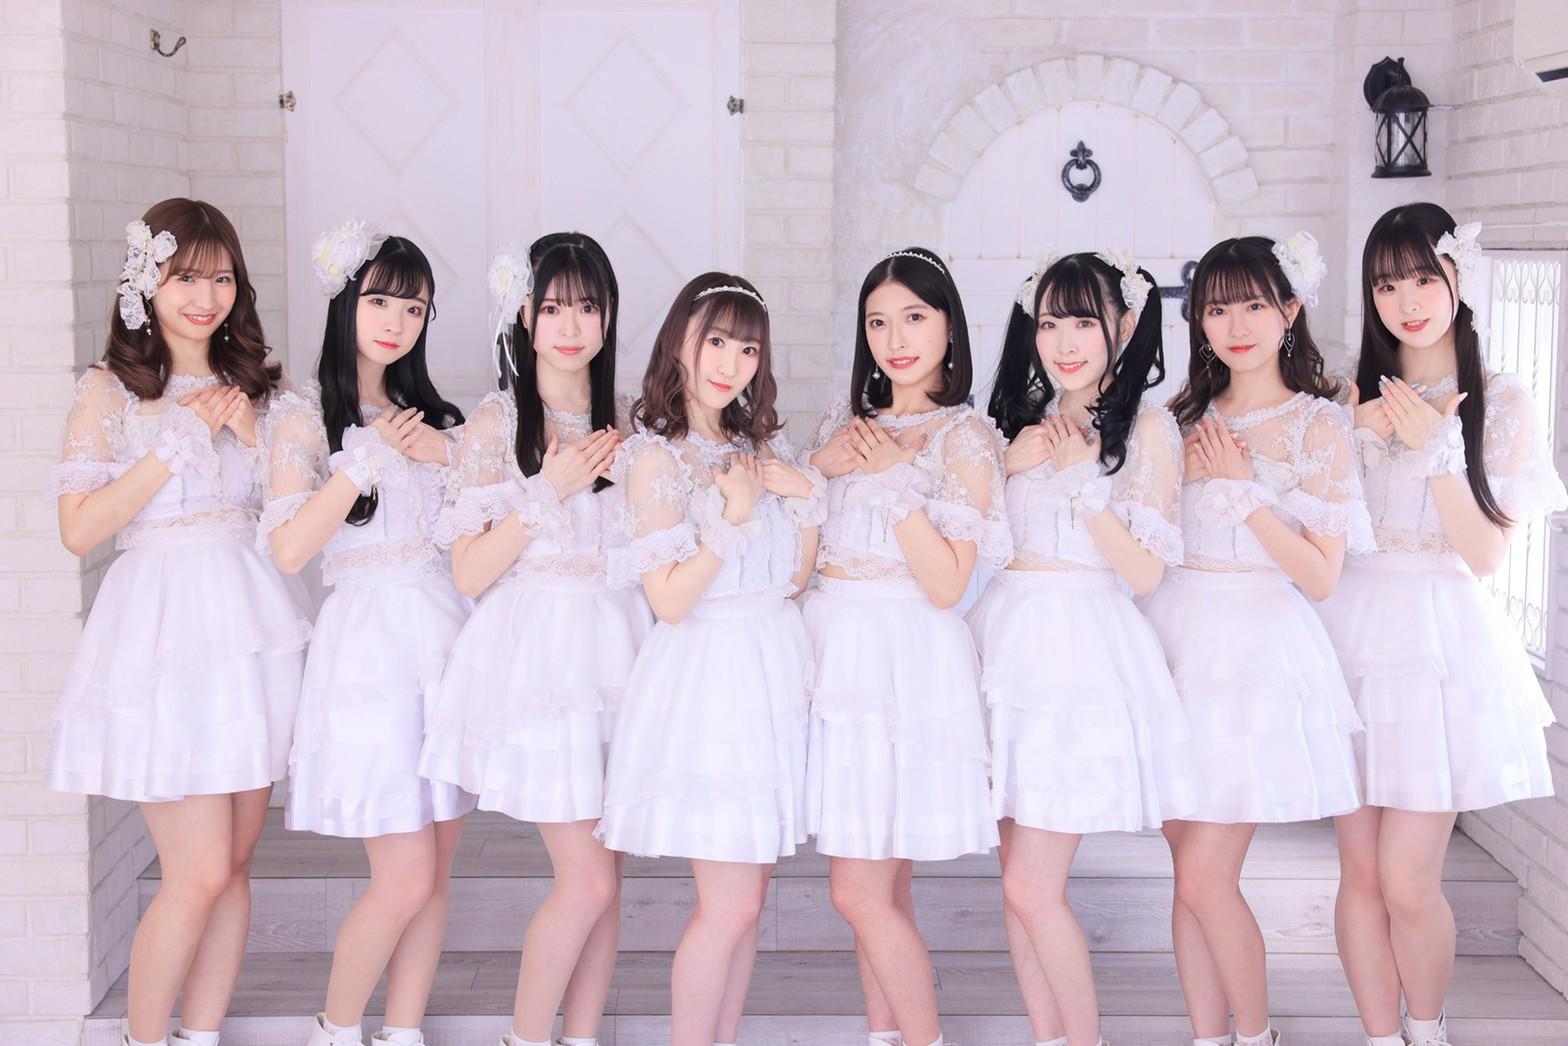 AKIBAカルチャーズ劇場LIVE #705